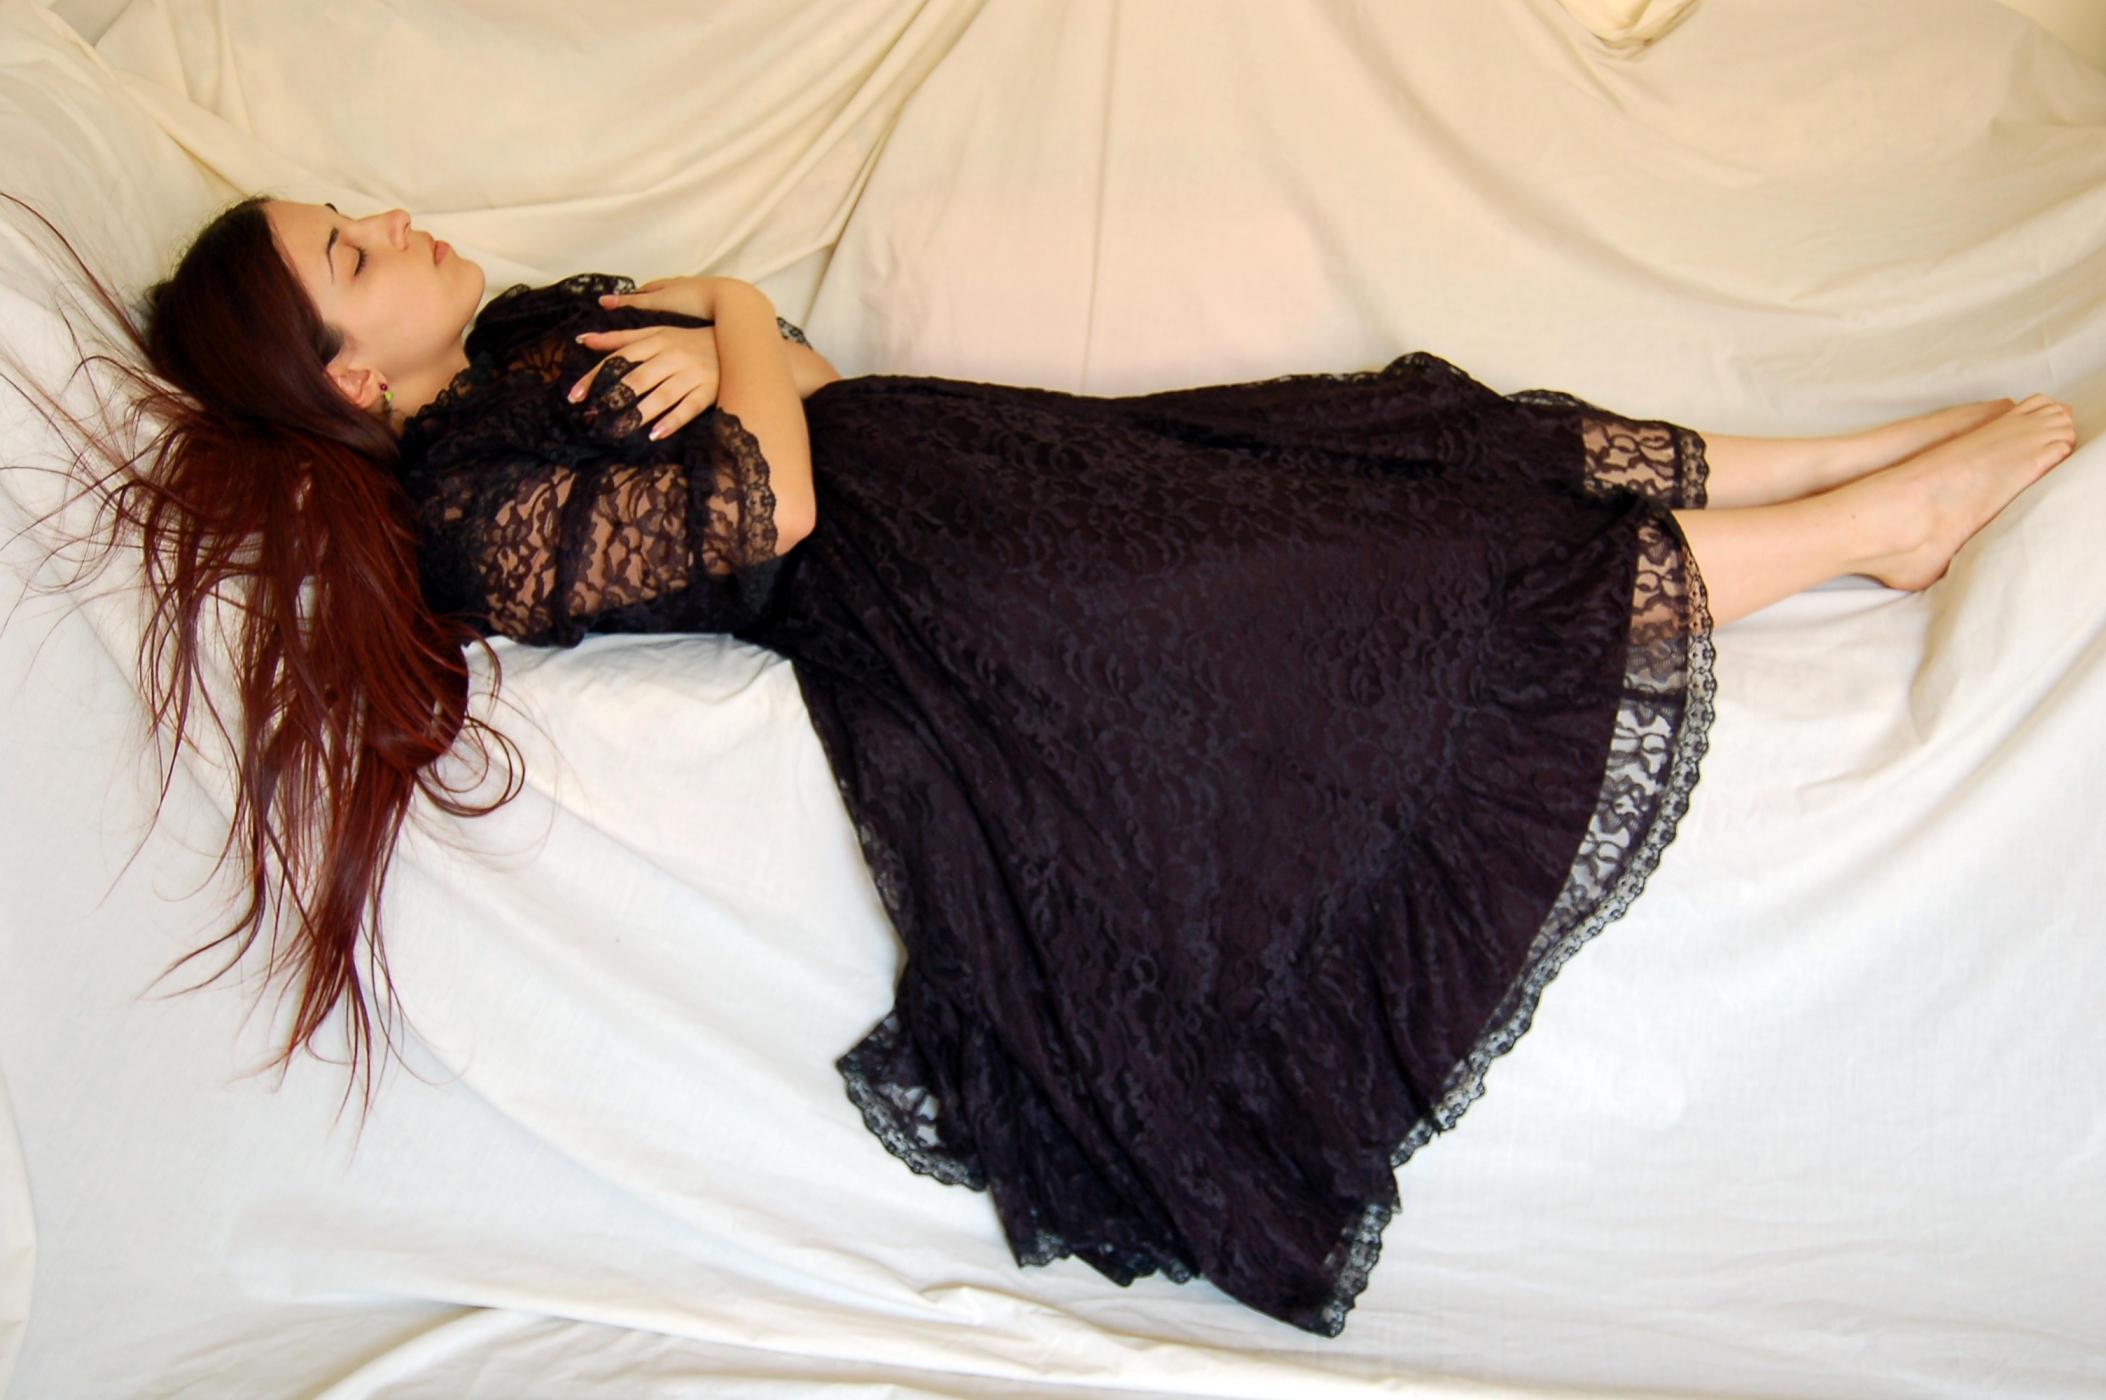 Black Lace dress 12 by InTenebris-Stock